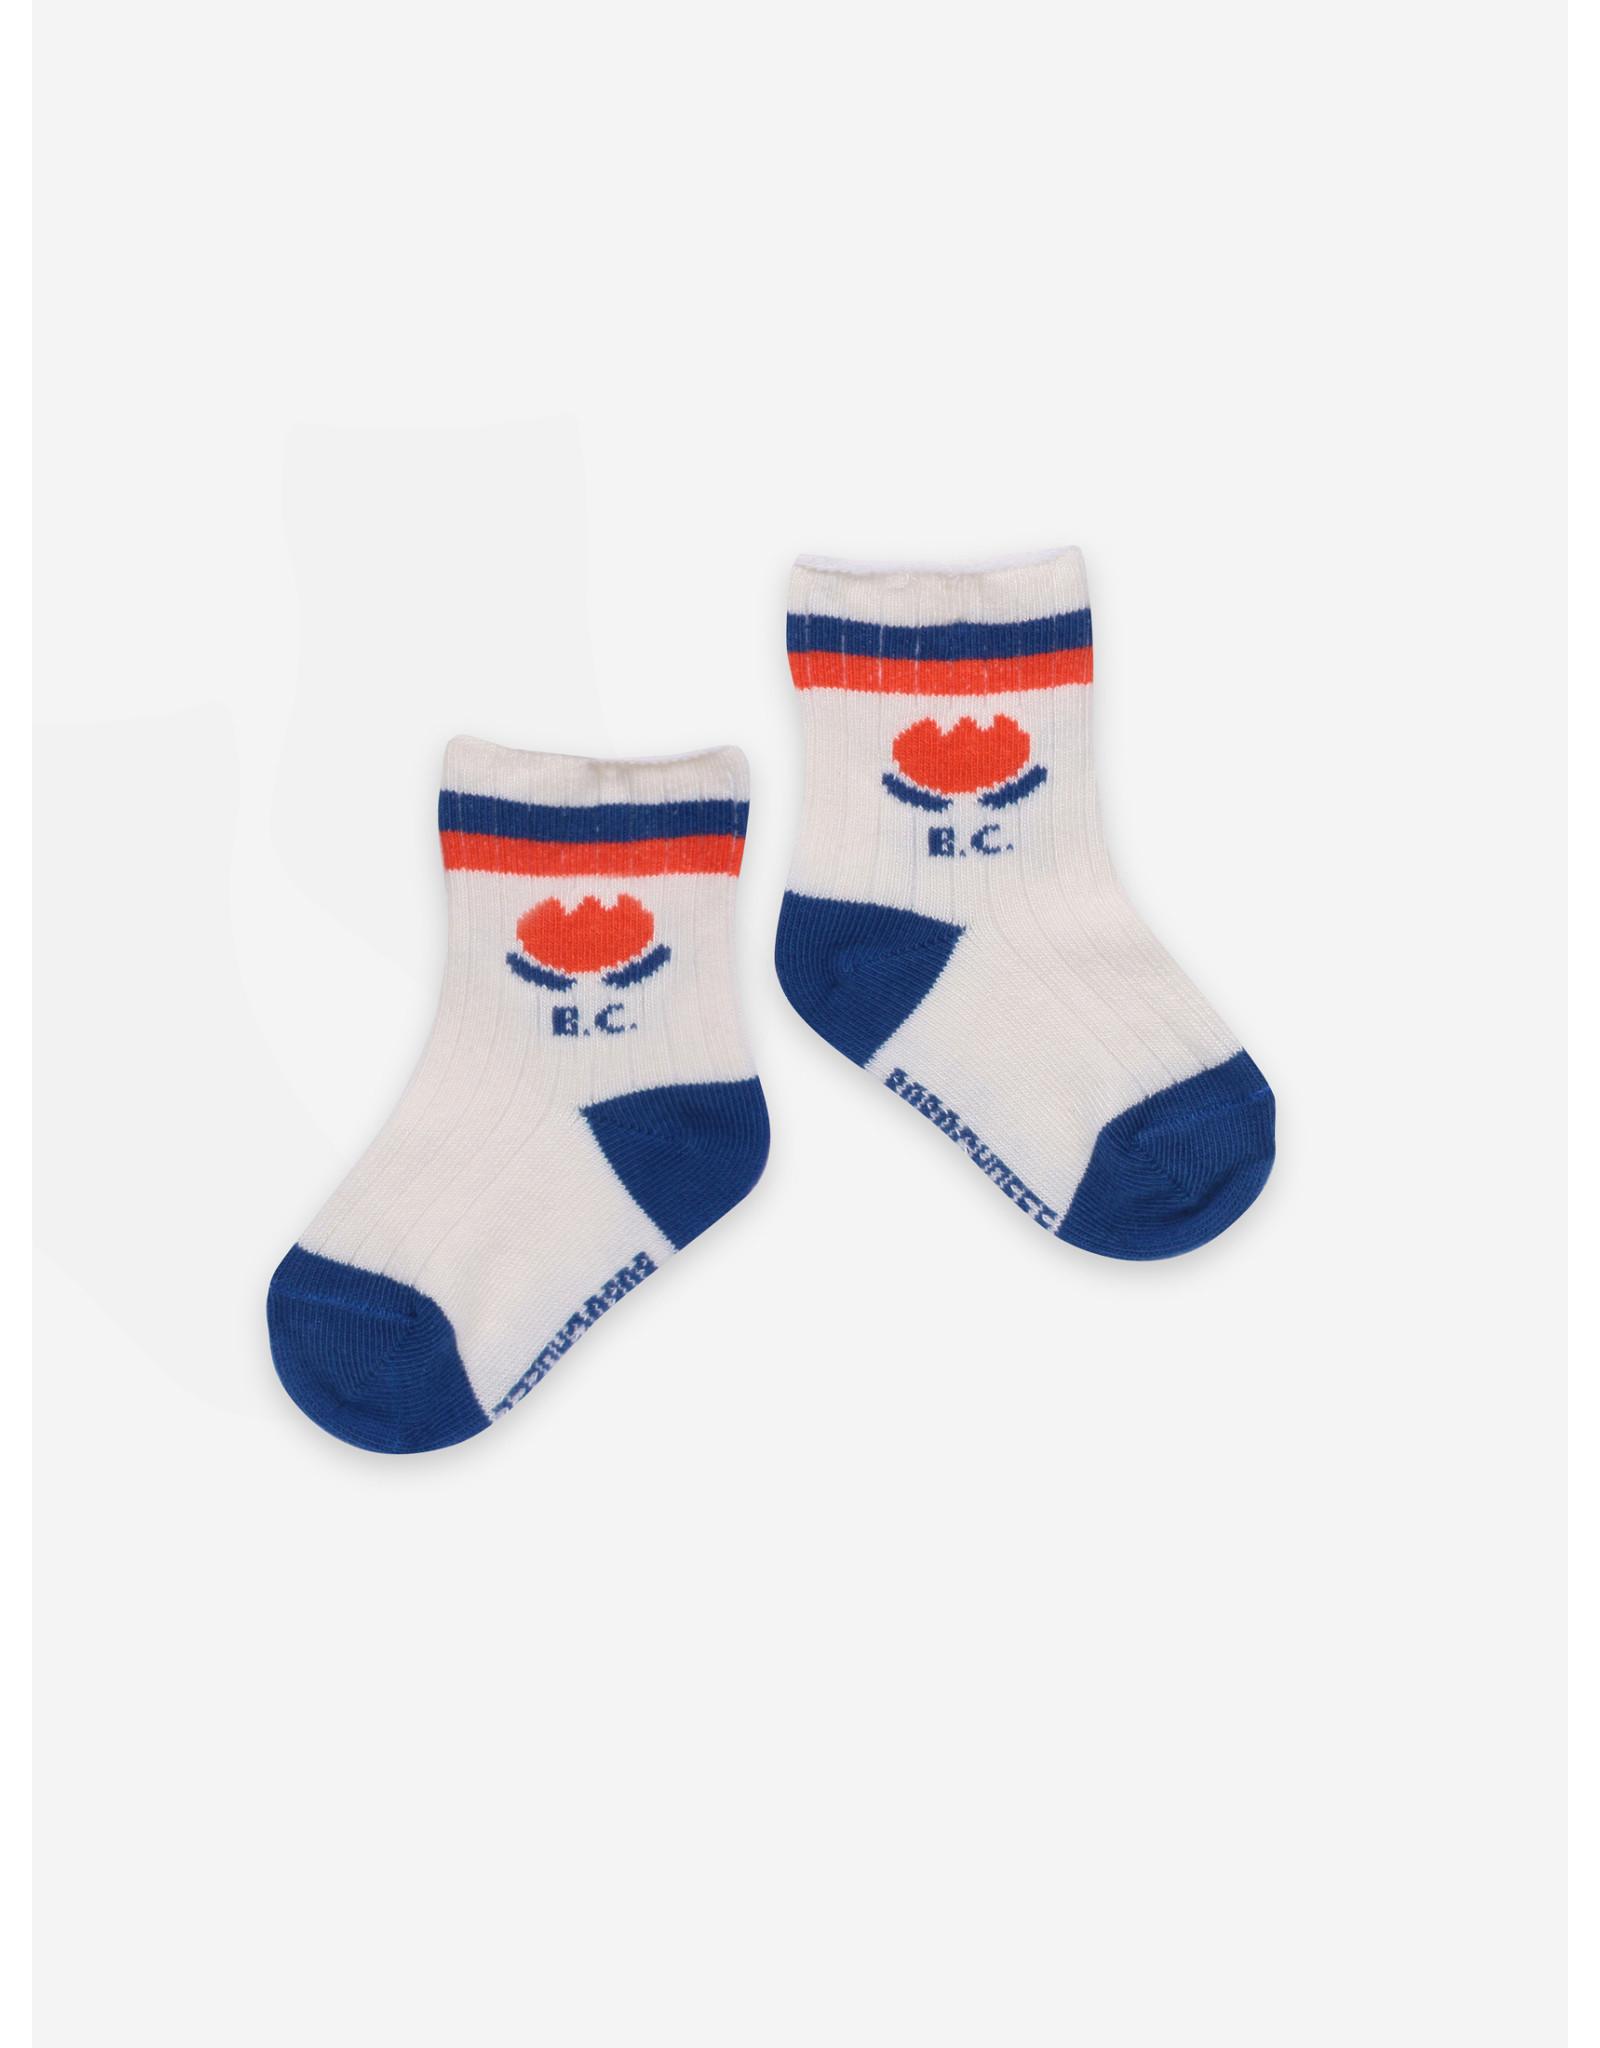 Bobo Choses Bobo Choses Chocolate Flowers Baby Socks